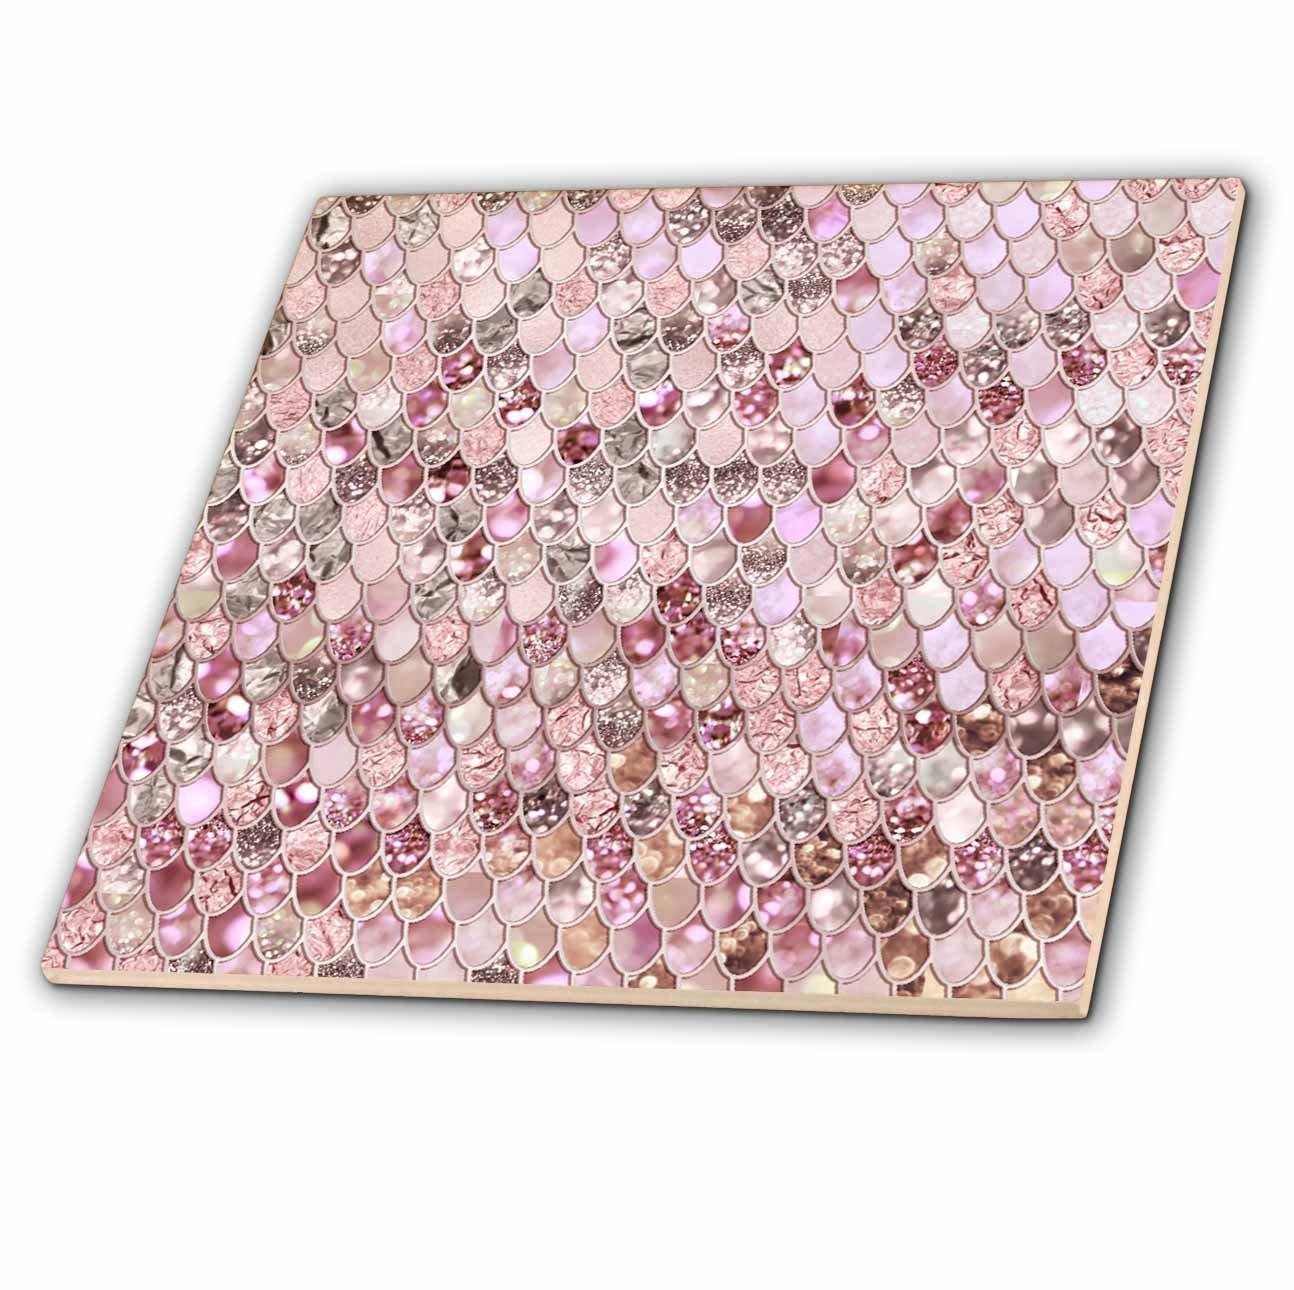 3dRose ct_275454_2 Image of Small Rose Gold Shiny Luxury Elegant Mermaid Scales Glitter Ceramic Tiles,